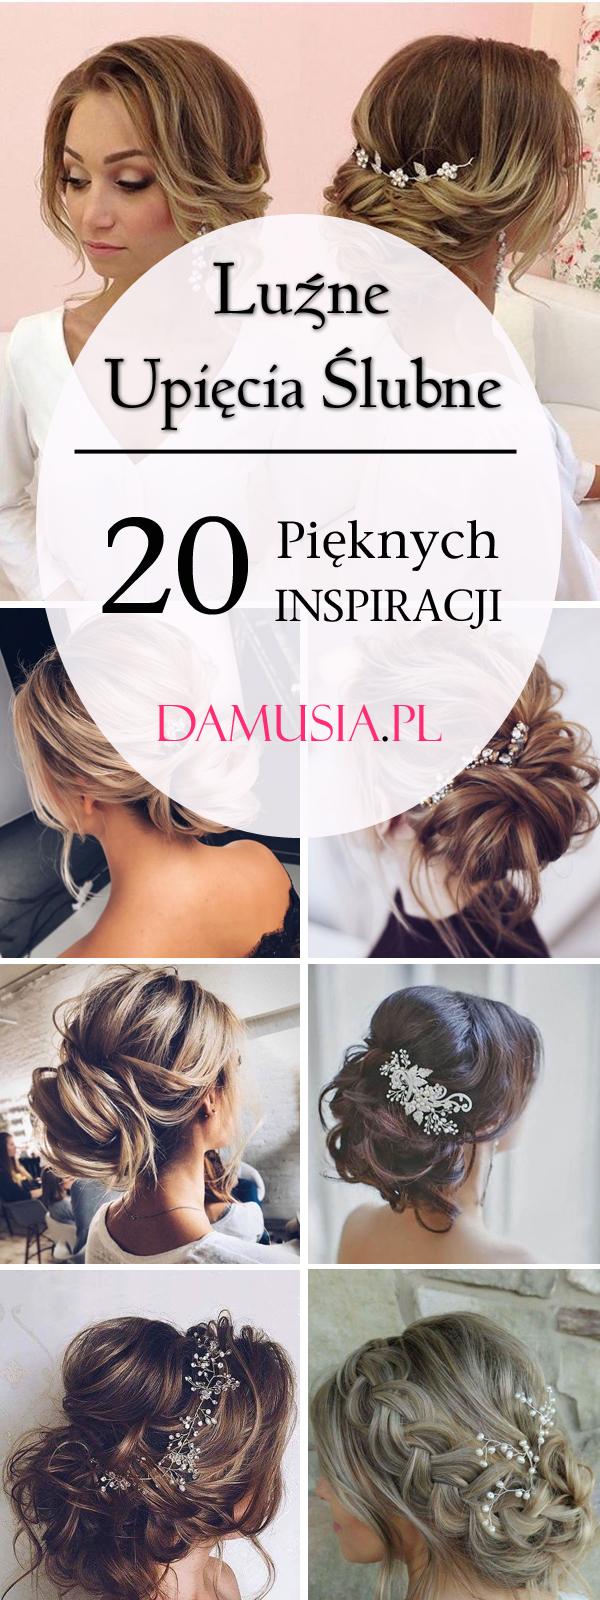 Luźne Upięcia ślubne 20 Pięknych Inspiracji Damusiapl